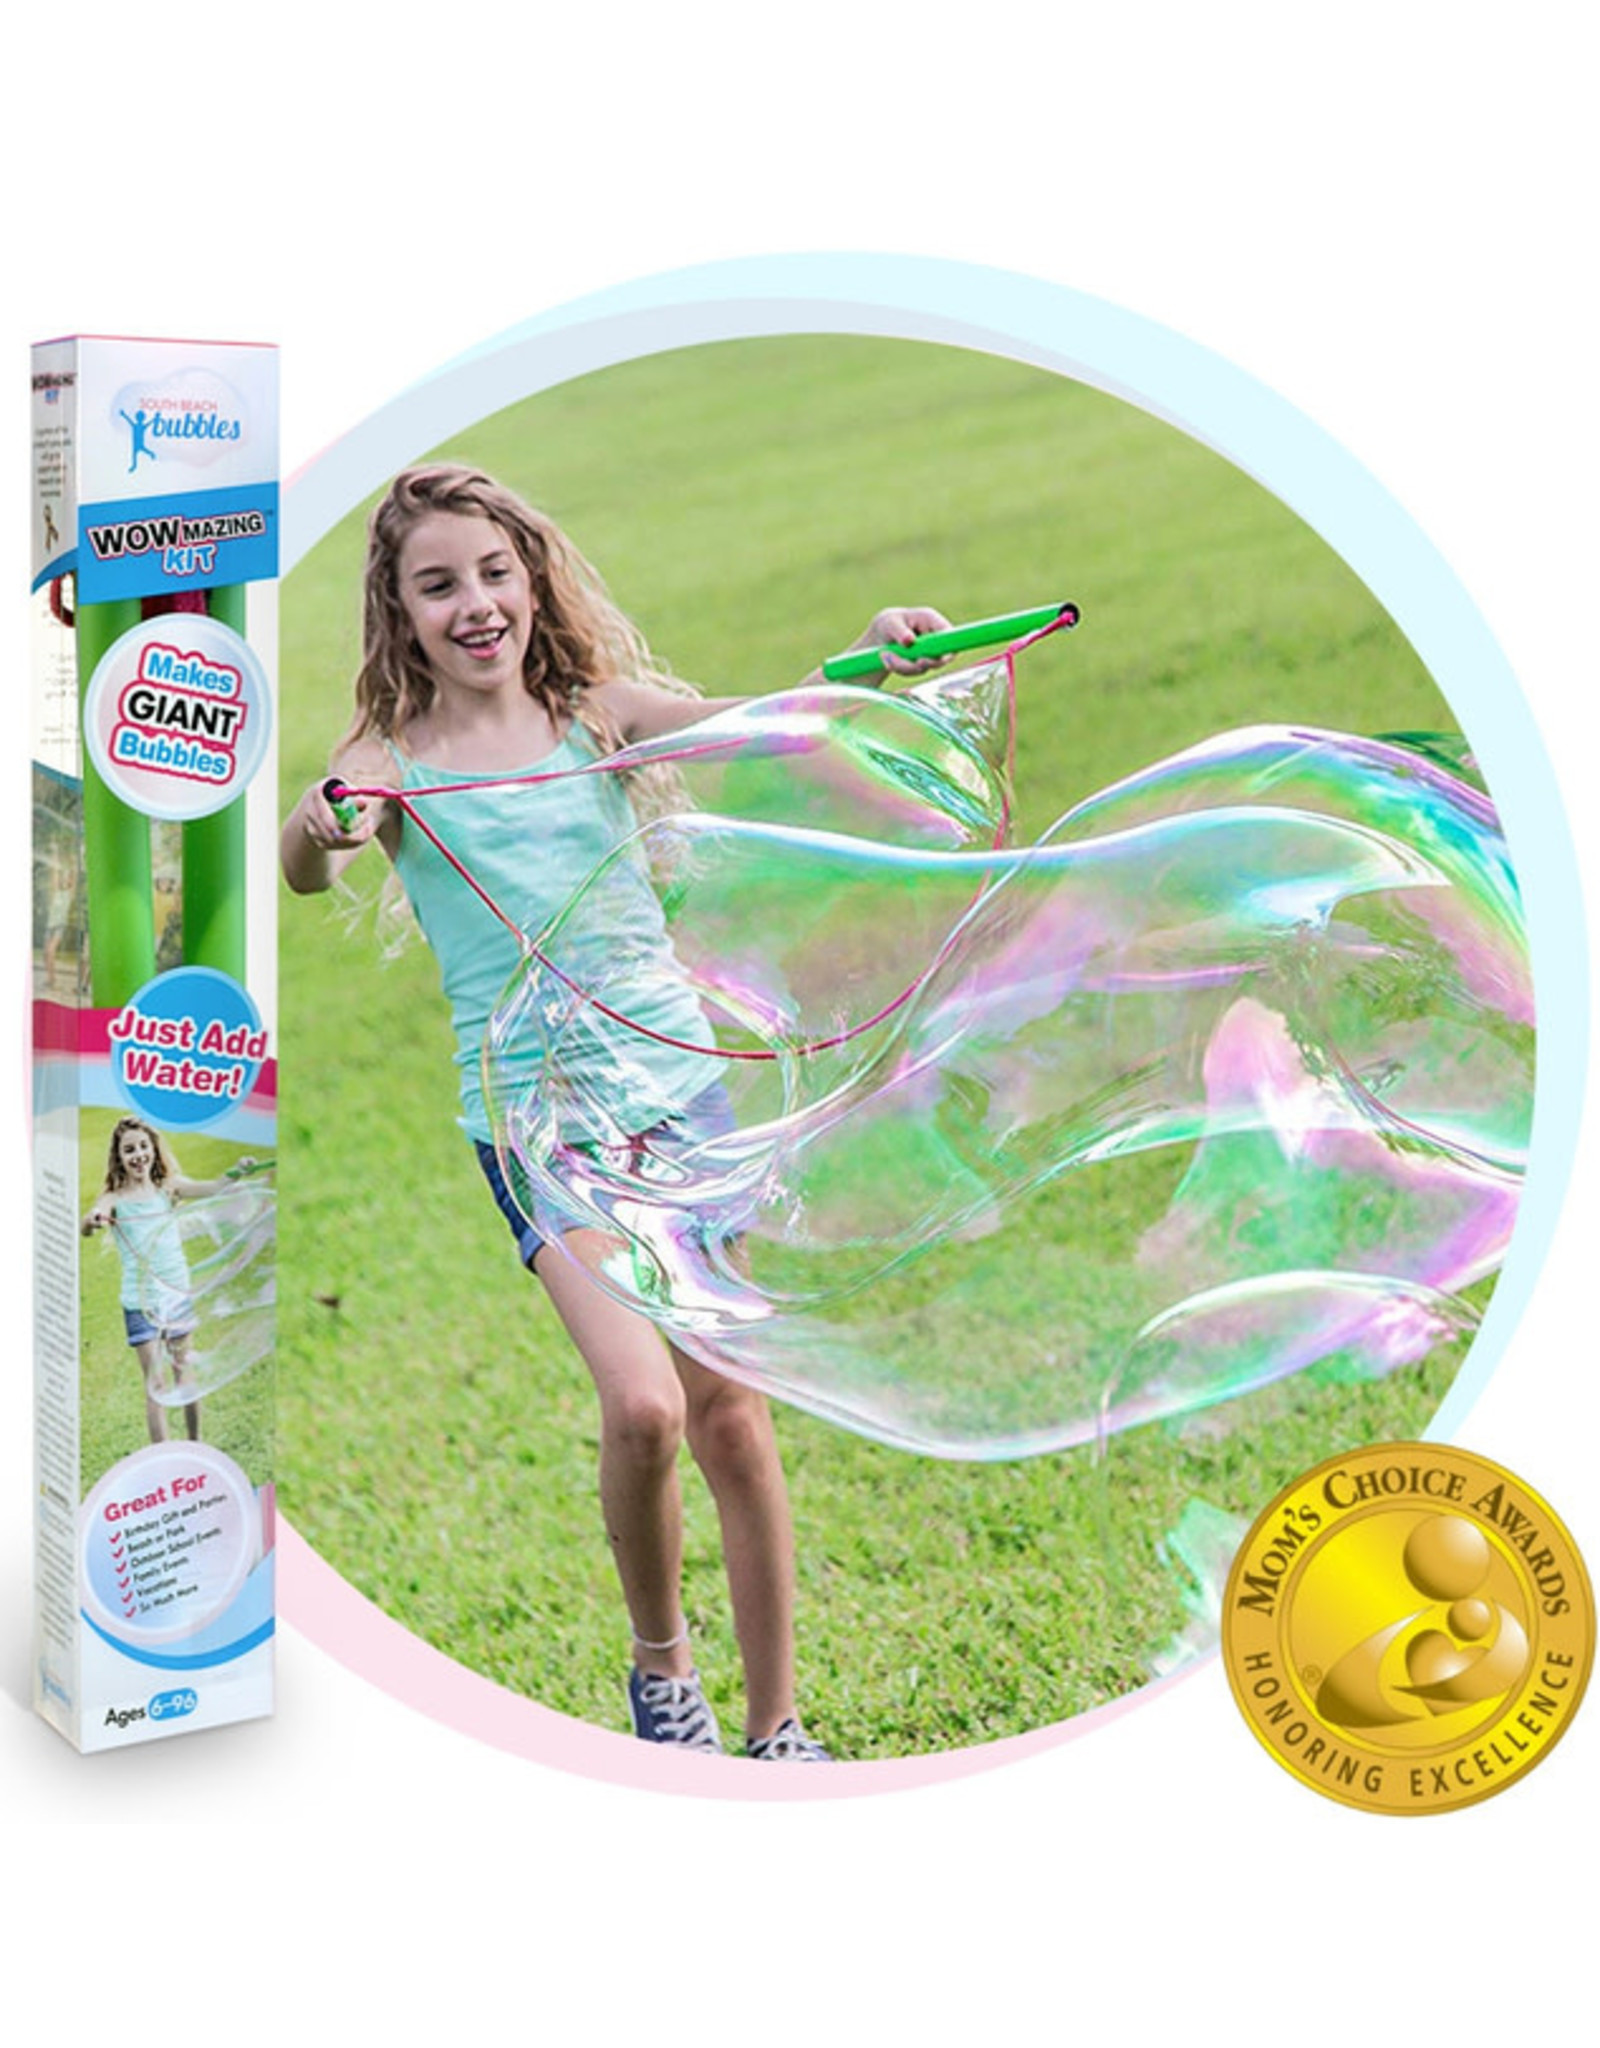 South Beach Bubbles Giant Bubble Concentrate Kit